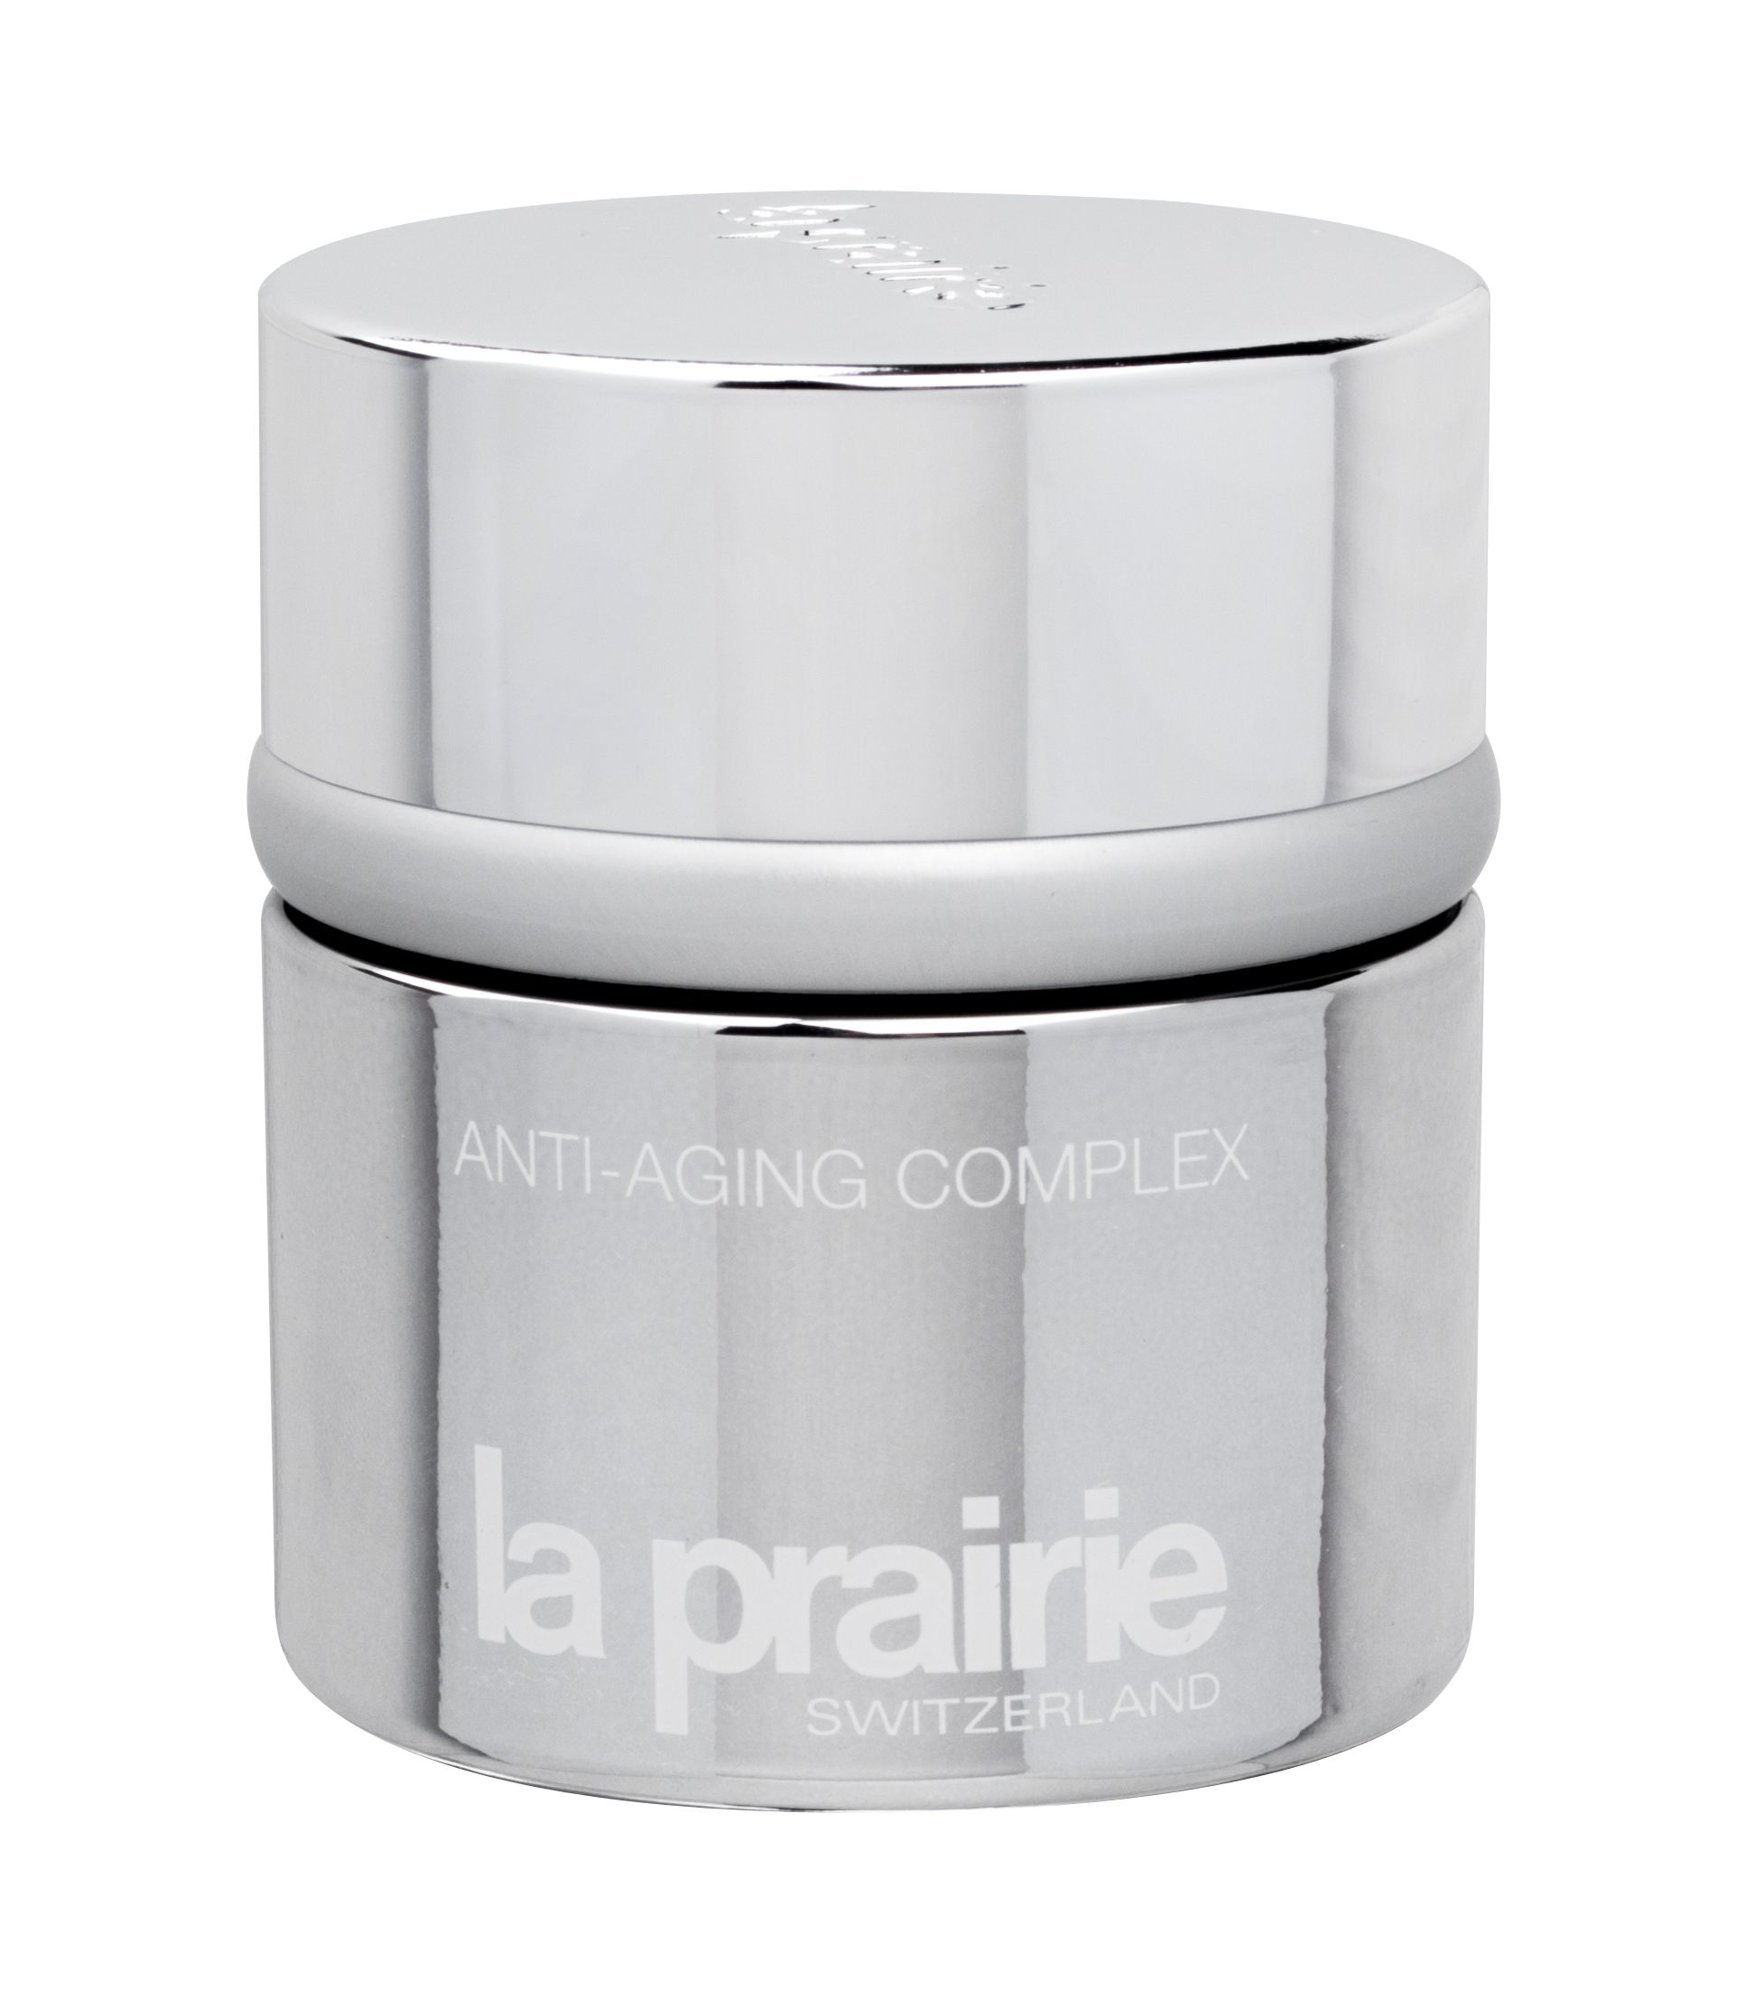 La Prairie Anti Aging Complex Cosmetic 50ml